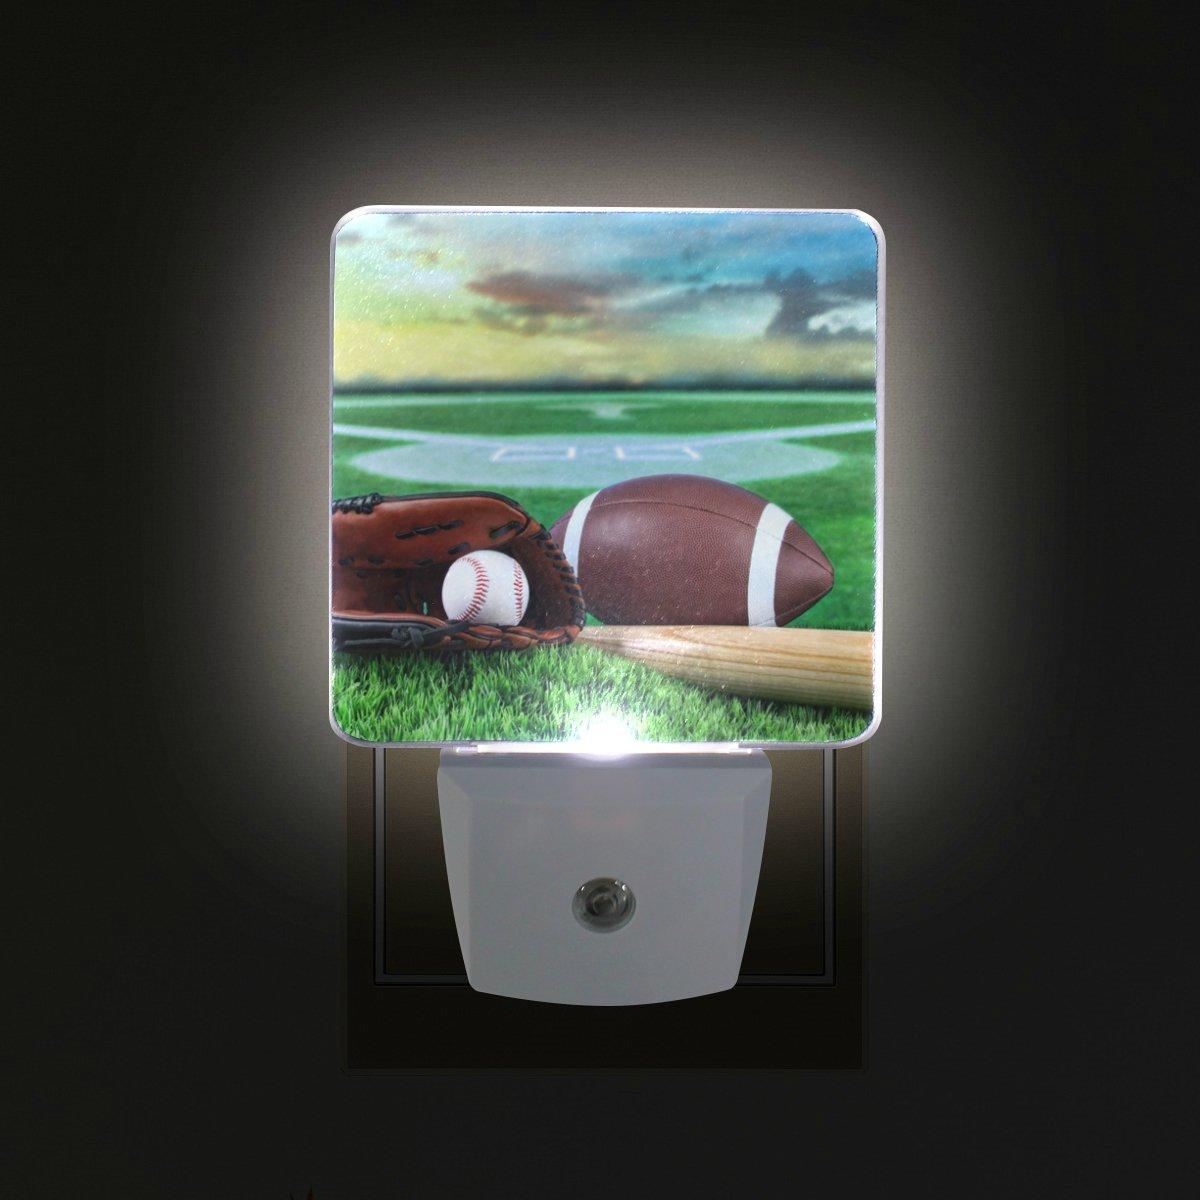 DEYYA American Football LED Night Light,Plug in Nightlights with Dusk to Dawn Sensor for Bedroom Bathroom Hallway Kitchen